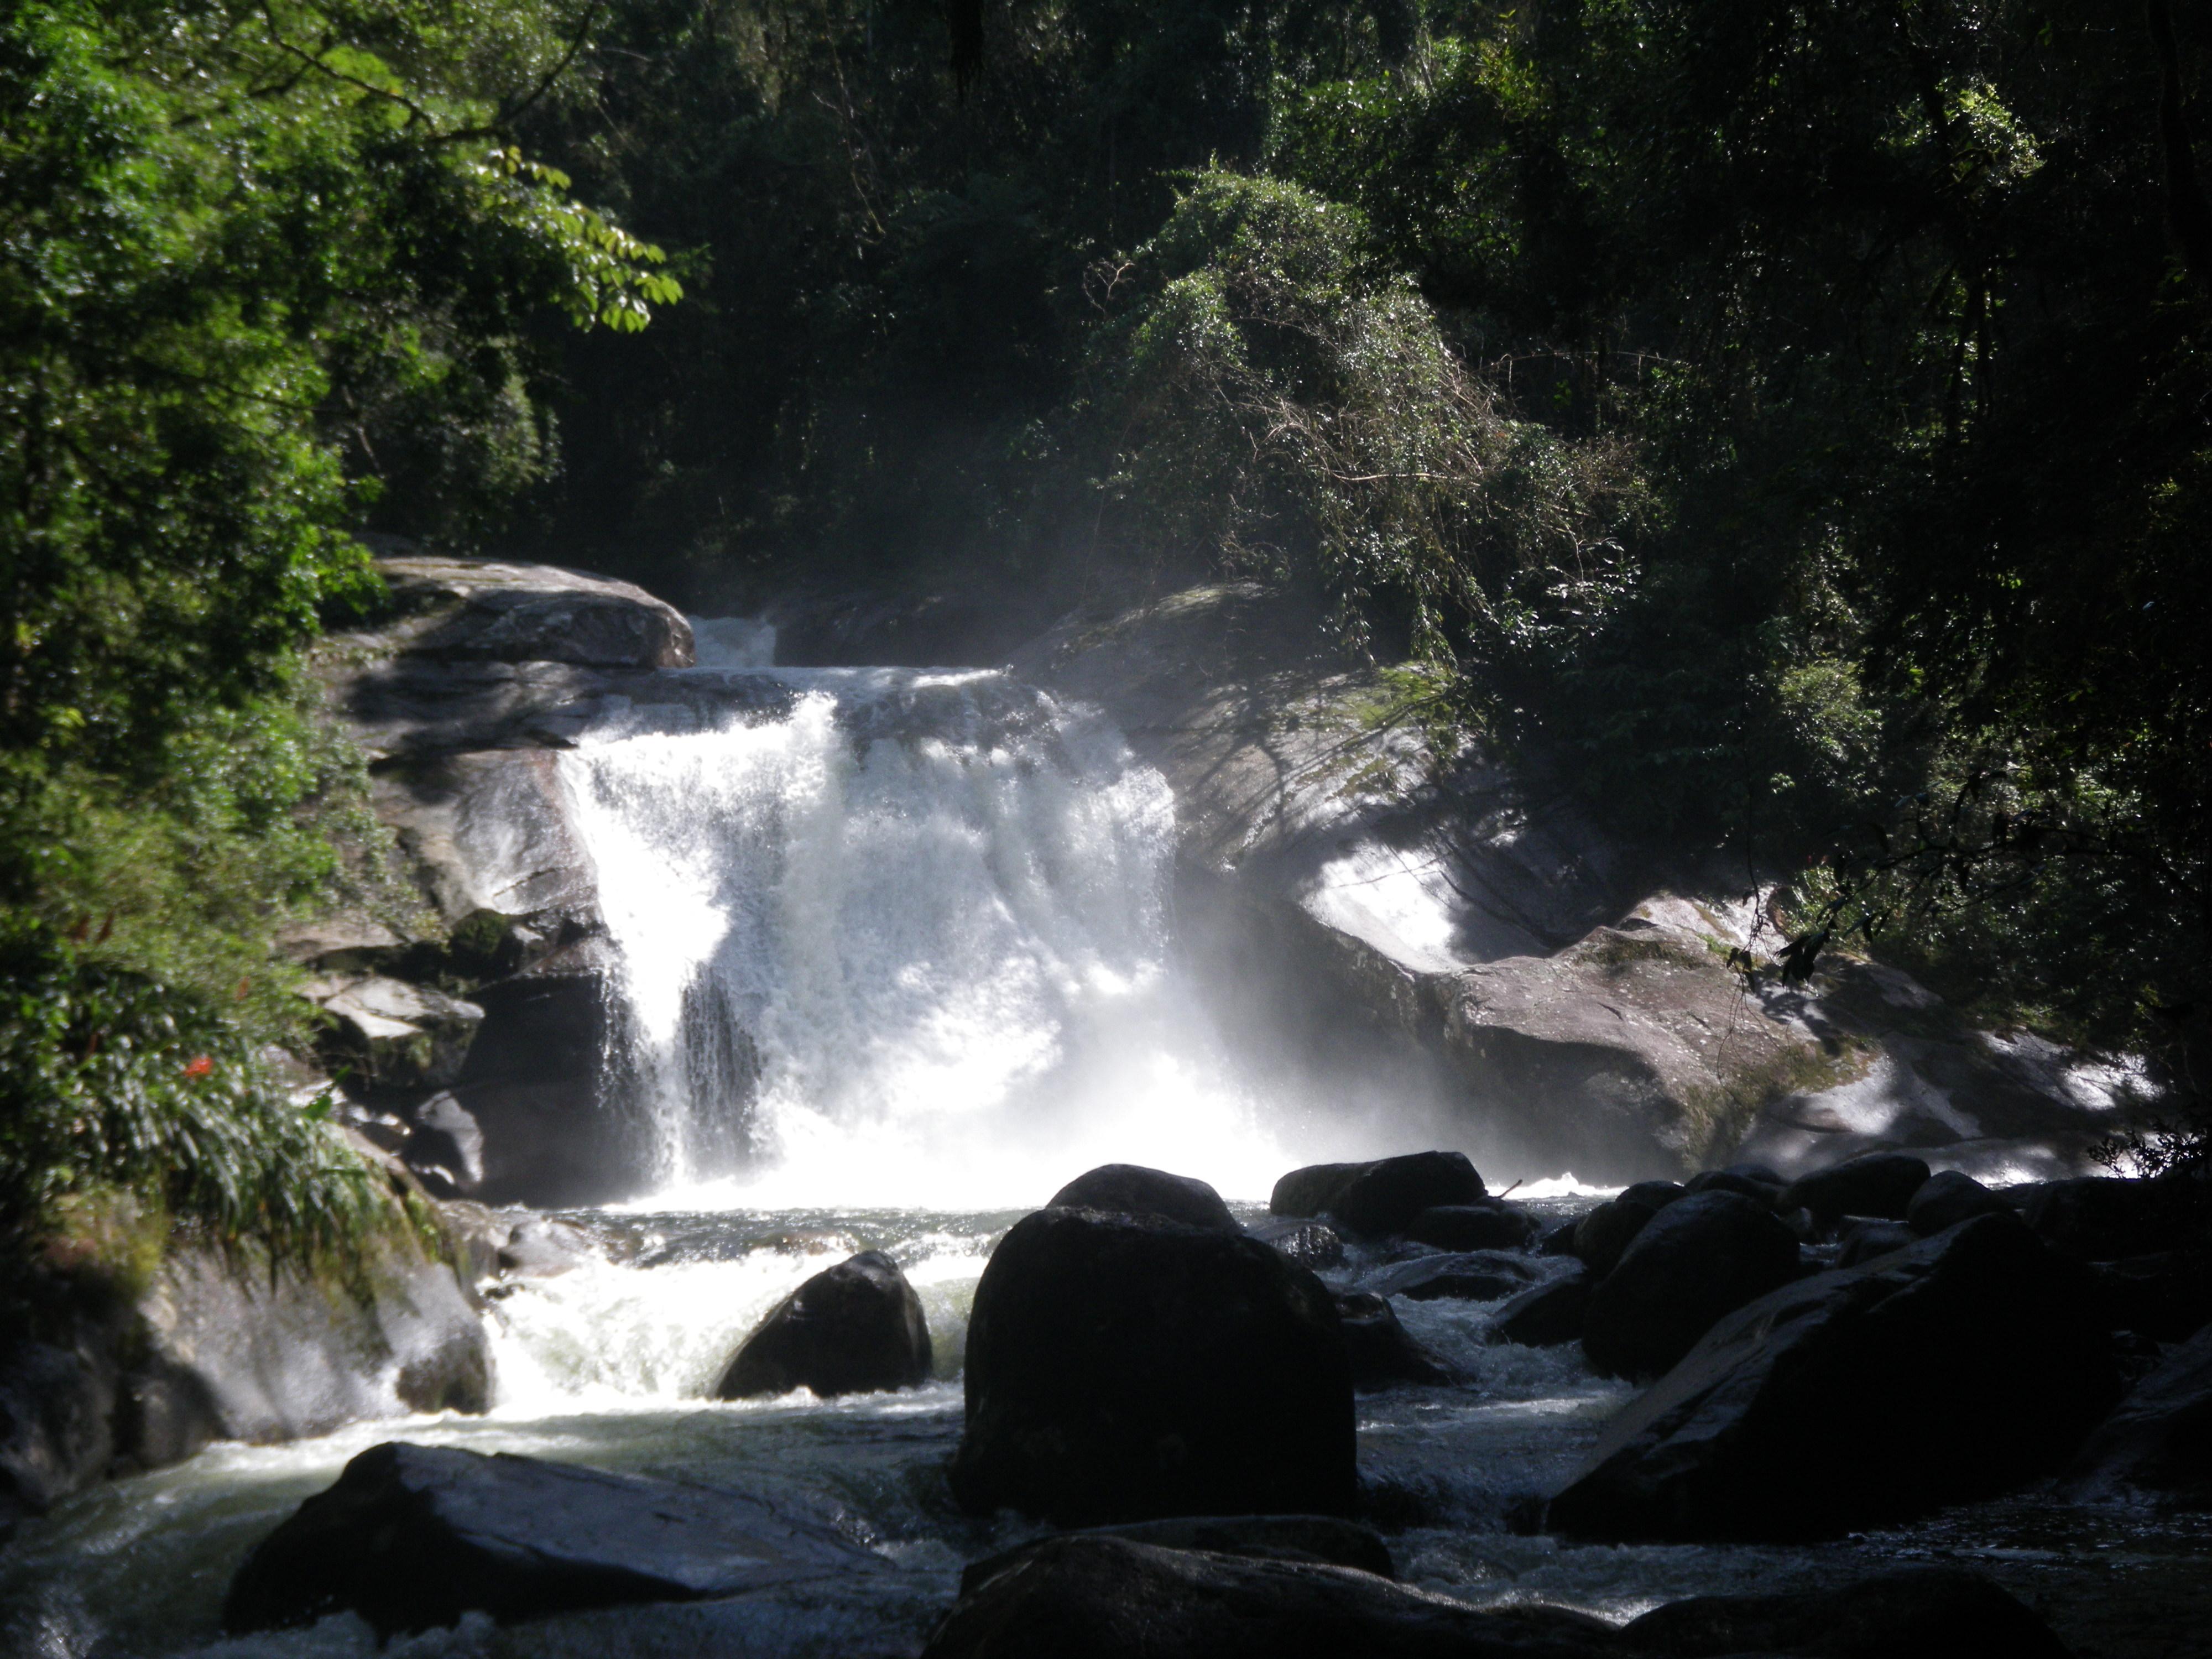 Mata Atlantica Wasserfall